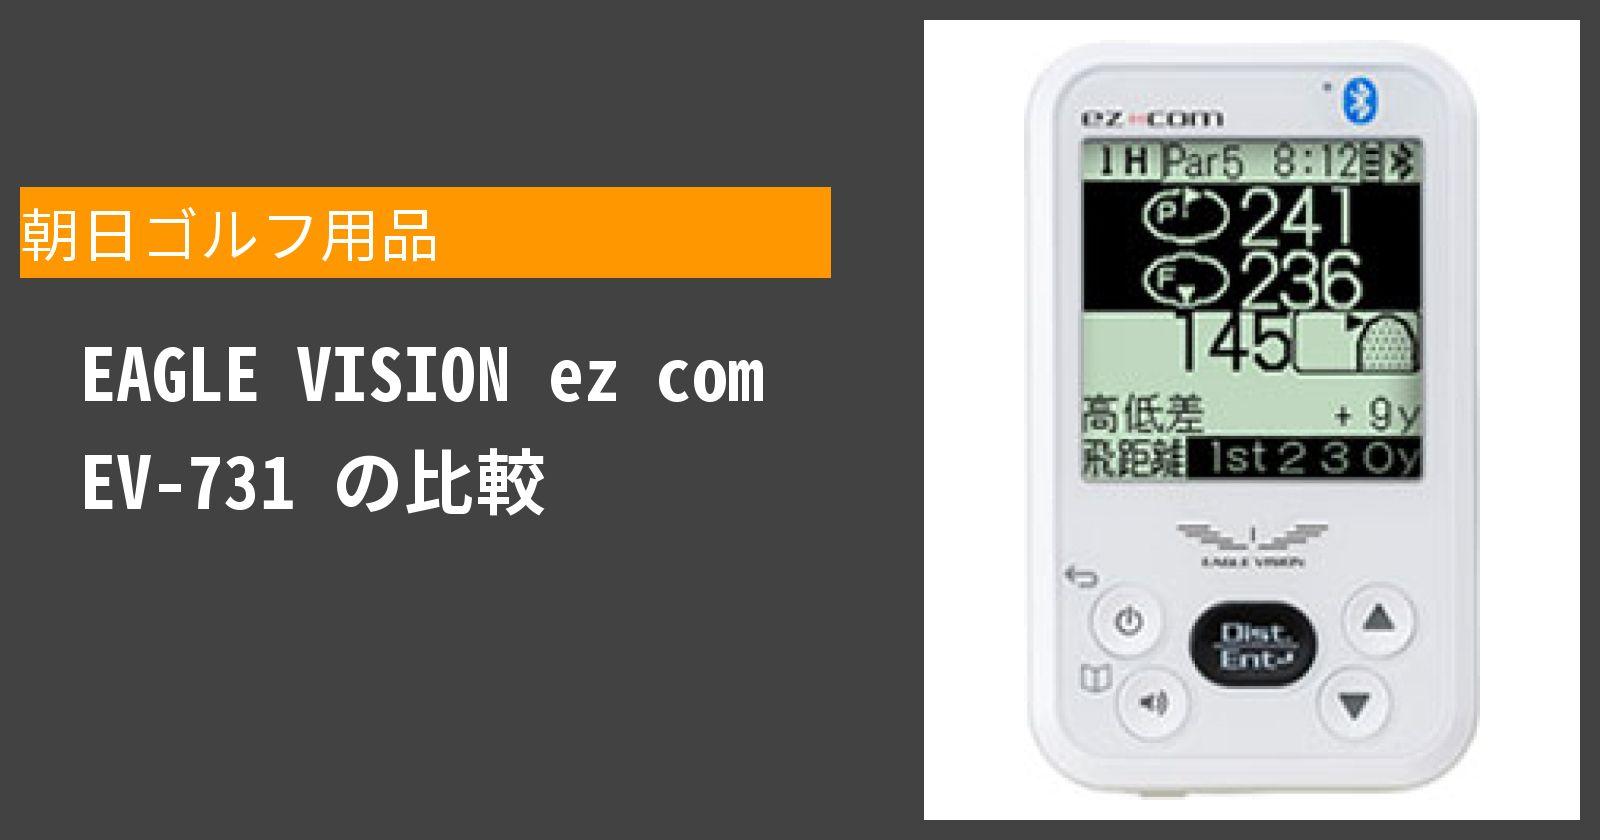 EAGLE VISION ez com EV-731を徹底評価